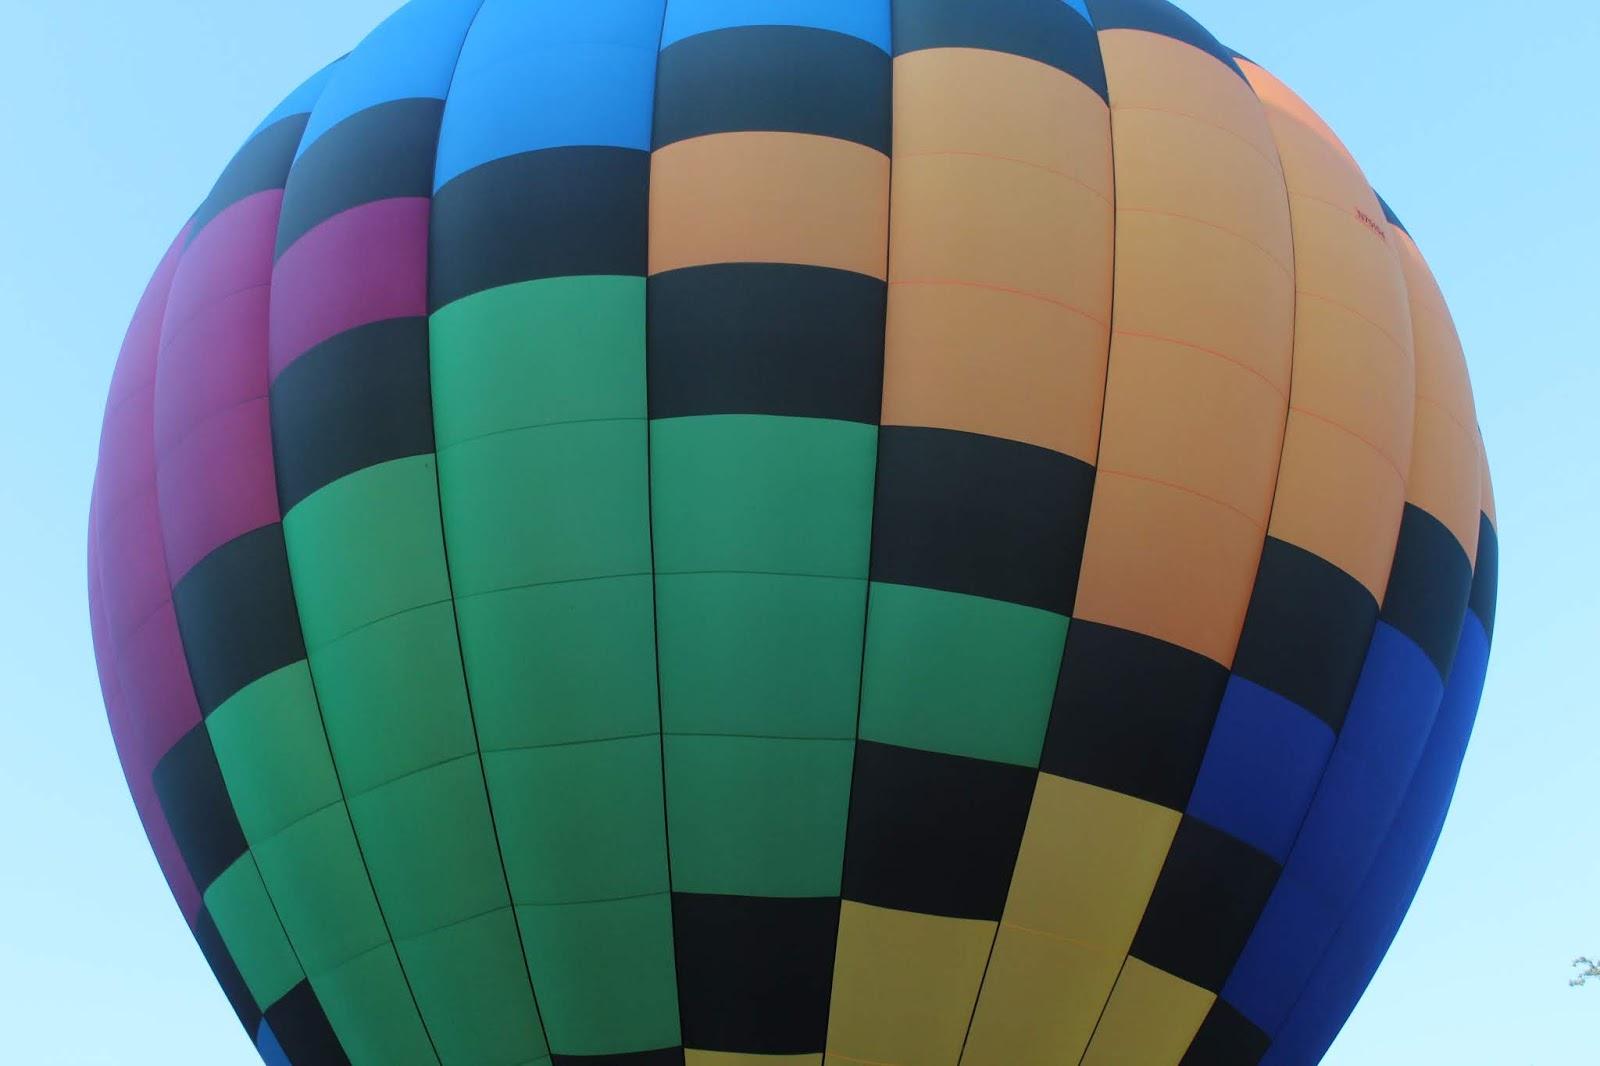 helen hot air balloon festival, atlanta, helen georgia, travel georgia, discover georgia, hot air balloon, hot air balloon festival america, hot air balloon US, hot air balloon rides, hot air balloon, hot air balloon festival near me